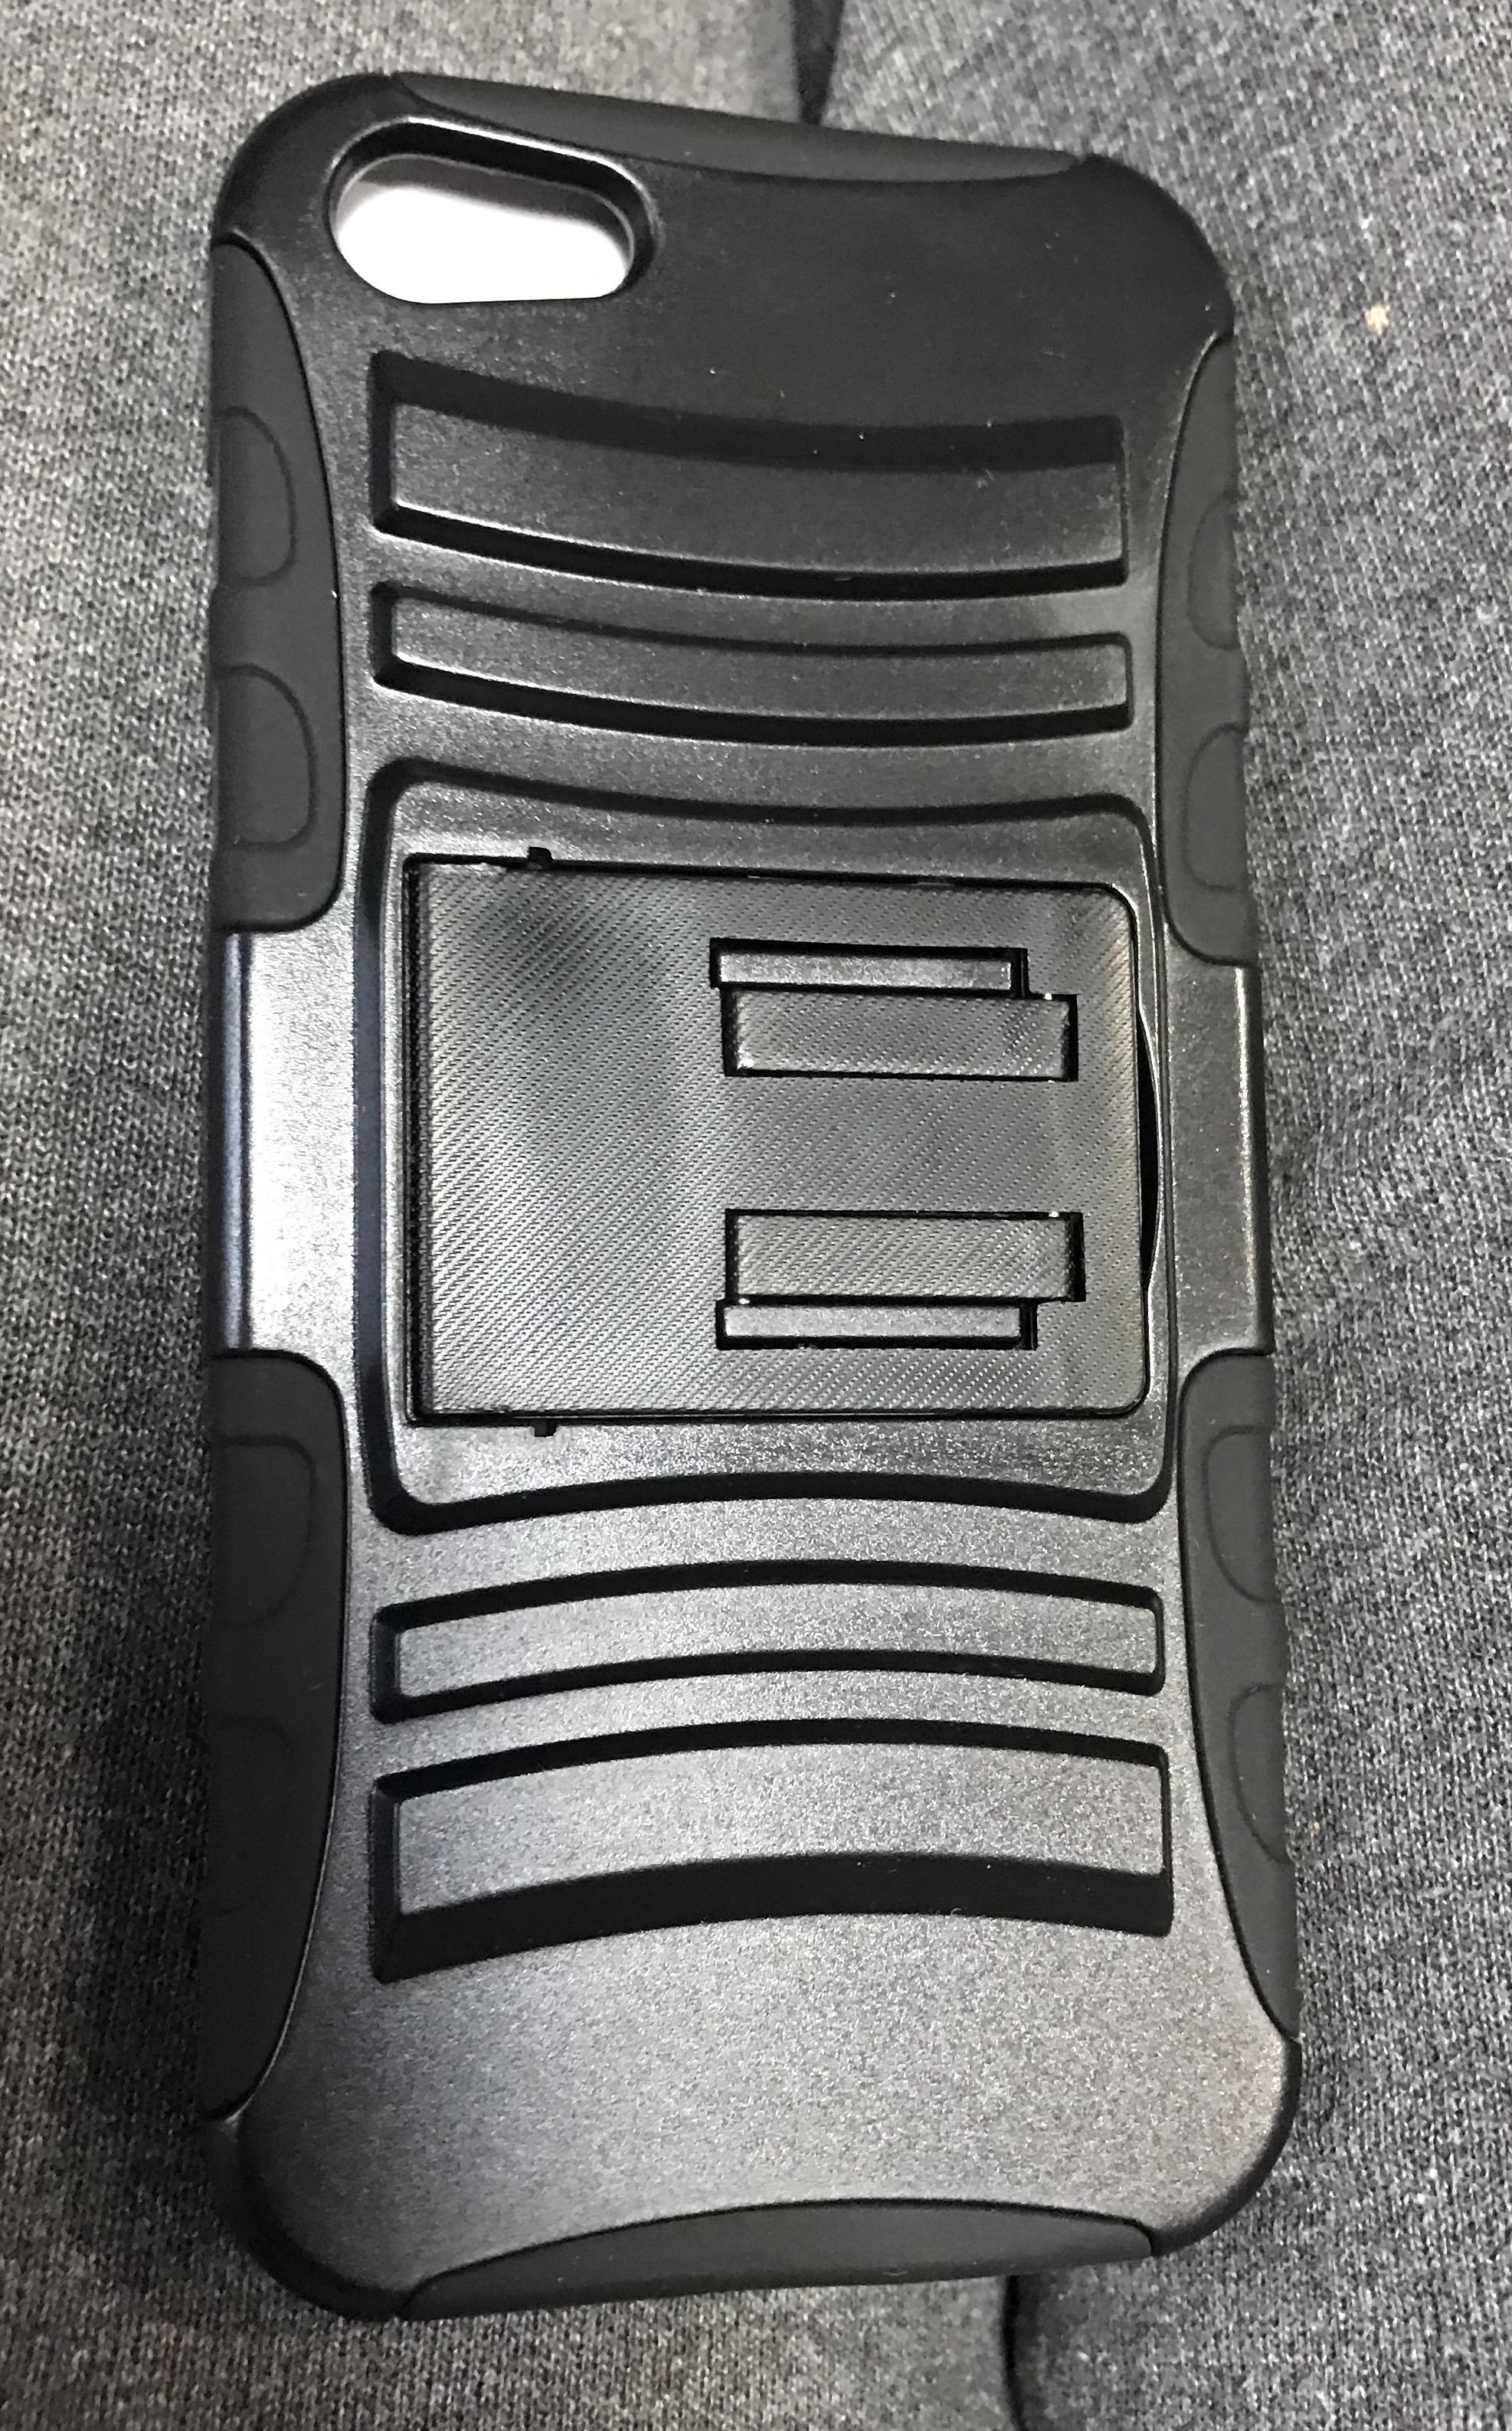 Cricket Designer Shield Apple iPhone 5 - Black